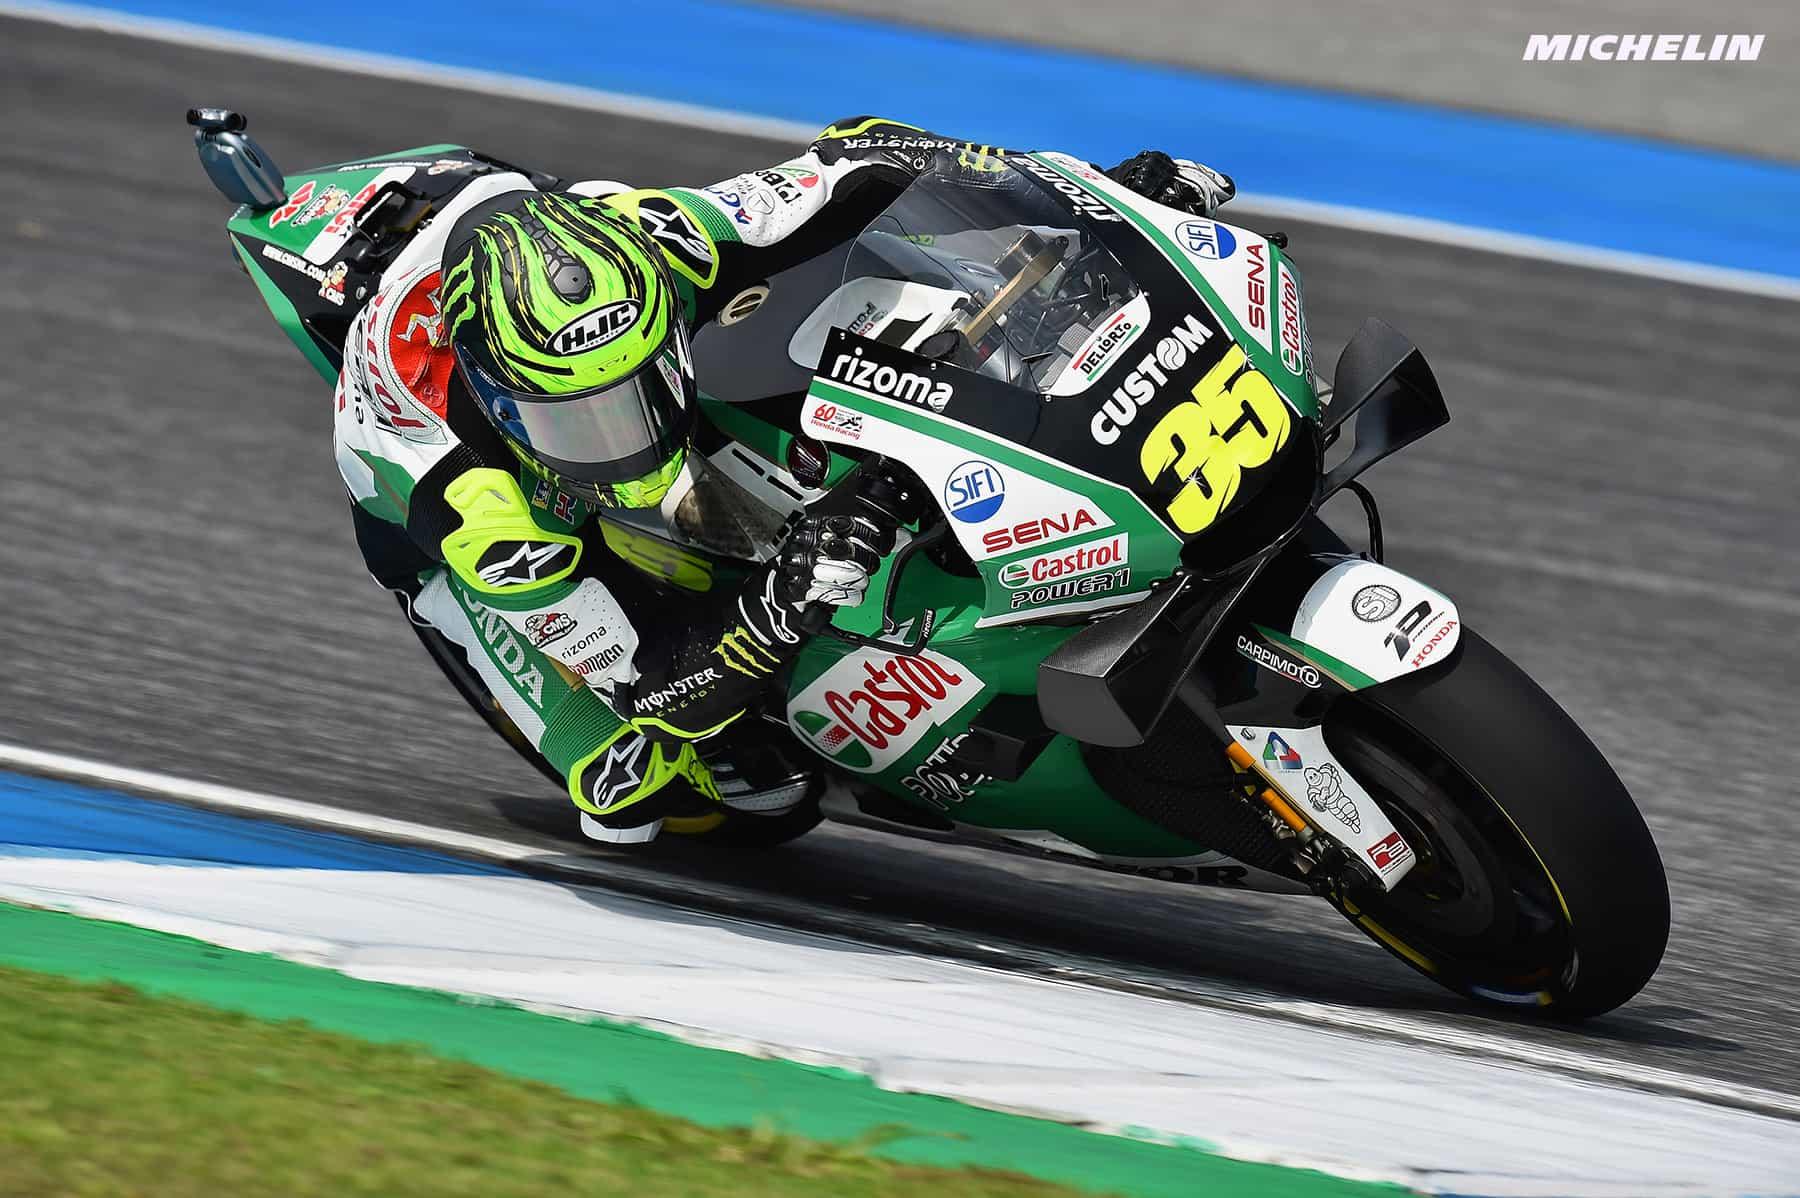 MotoGP2019タイGP 12位クラッチロー「序盤ブレーキに問題があった」